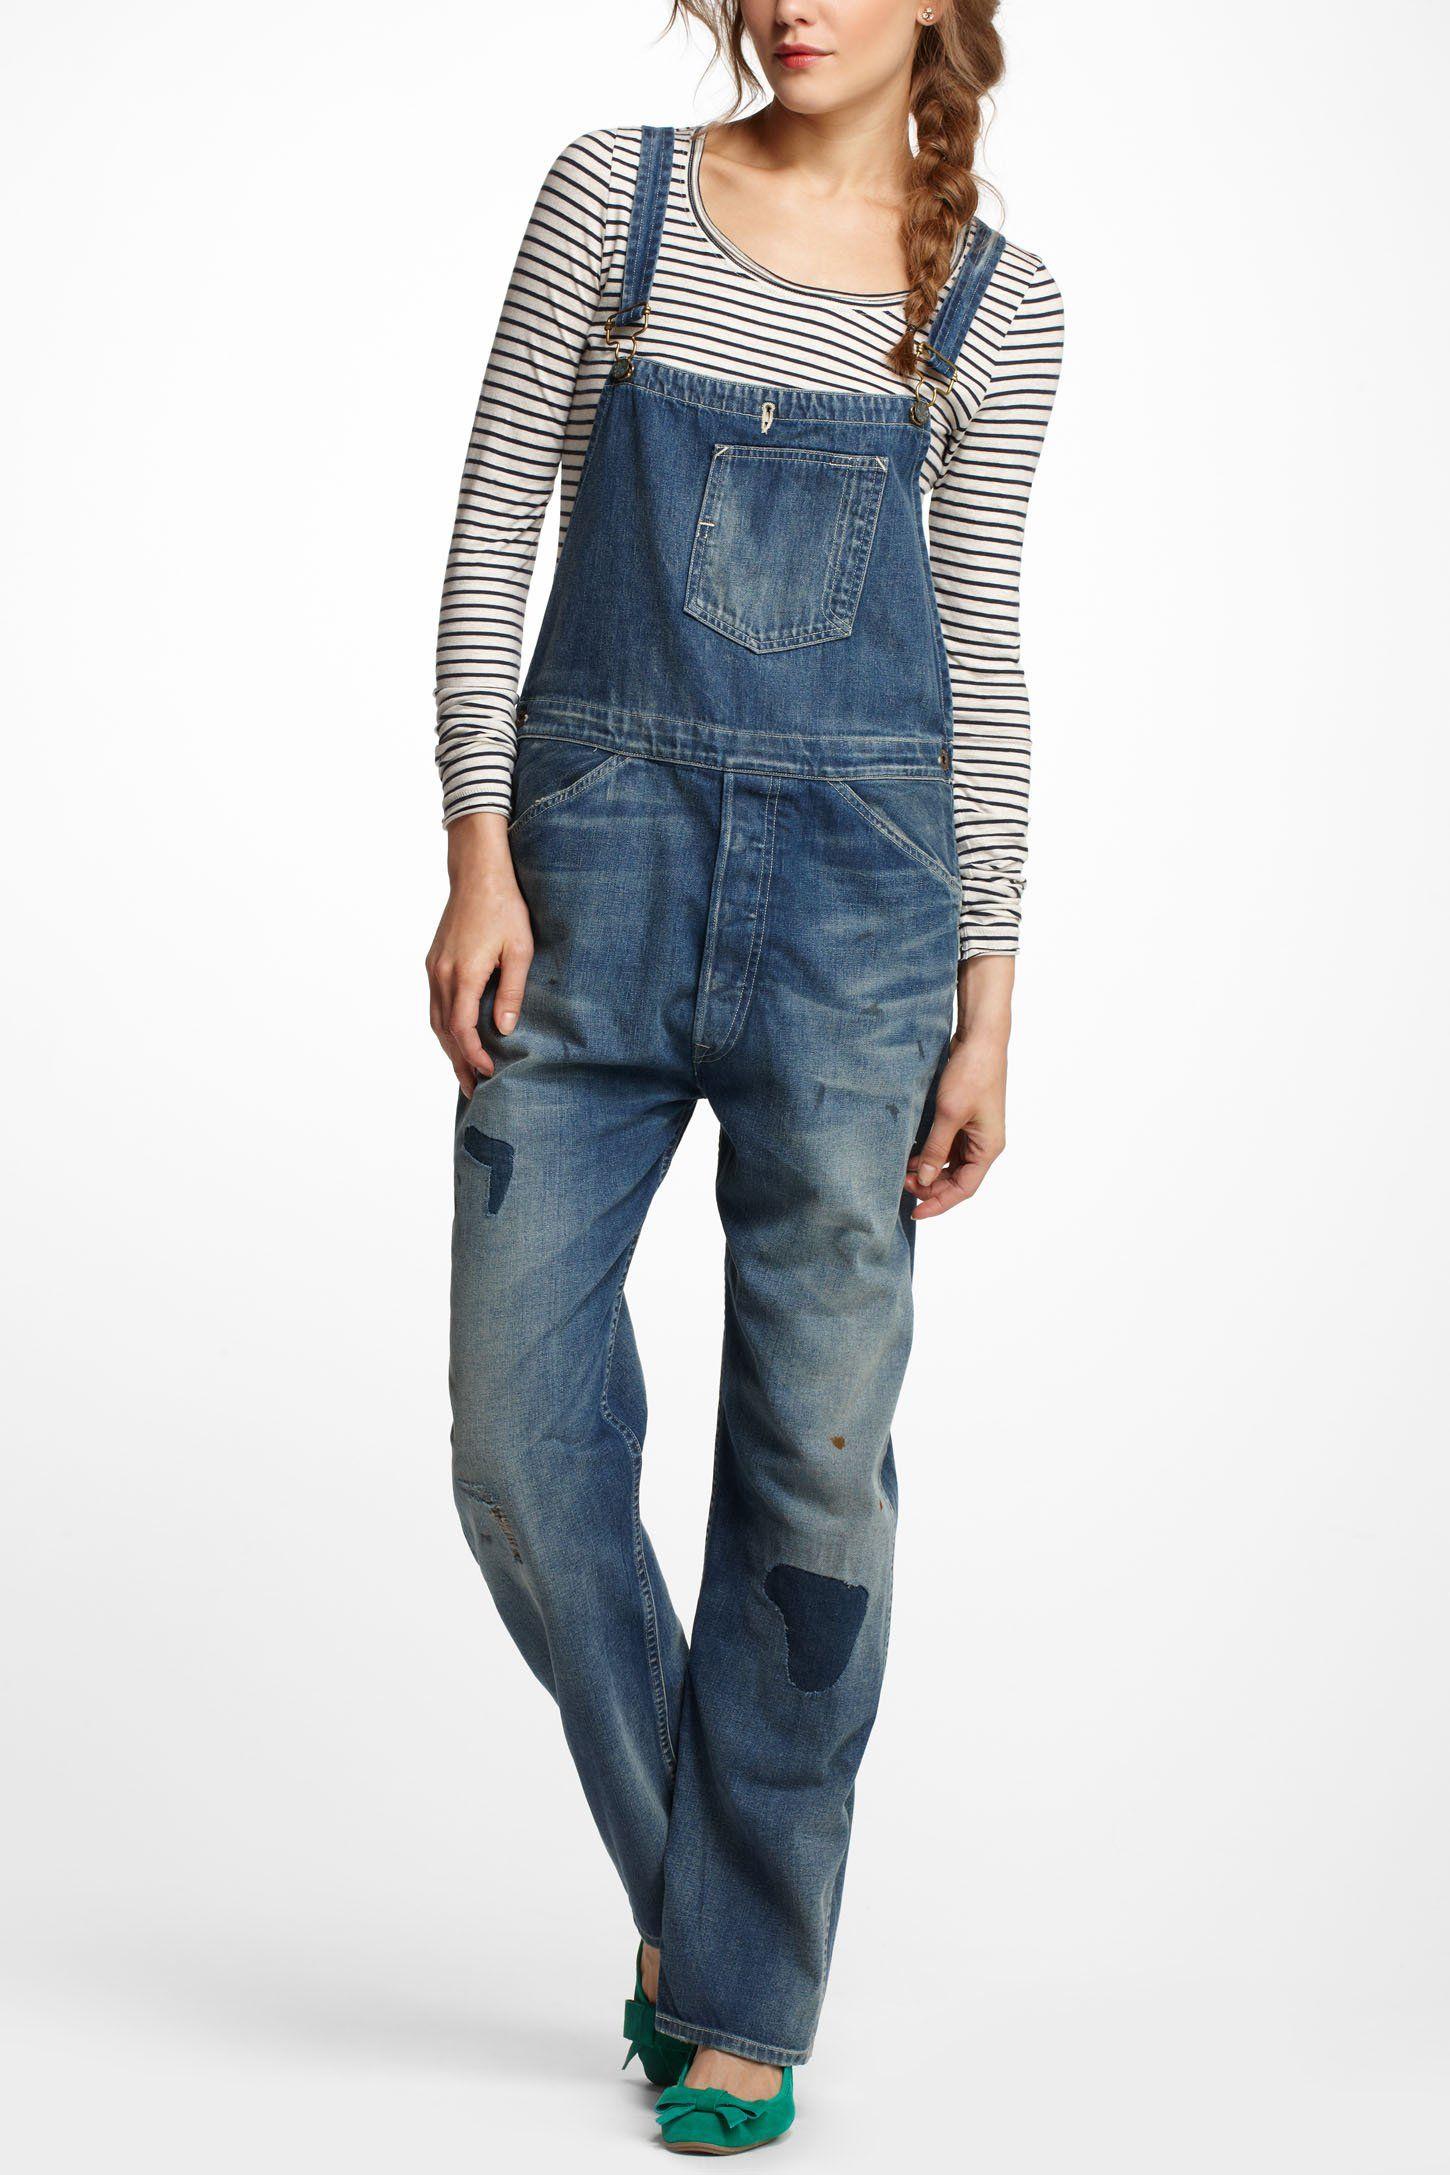 30a918940605 Levi s Vintage Clothing Bib   Brace Overalls